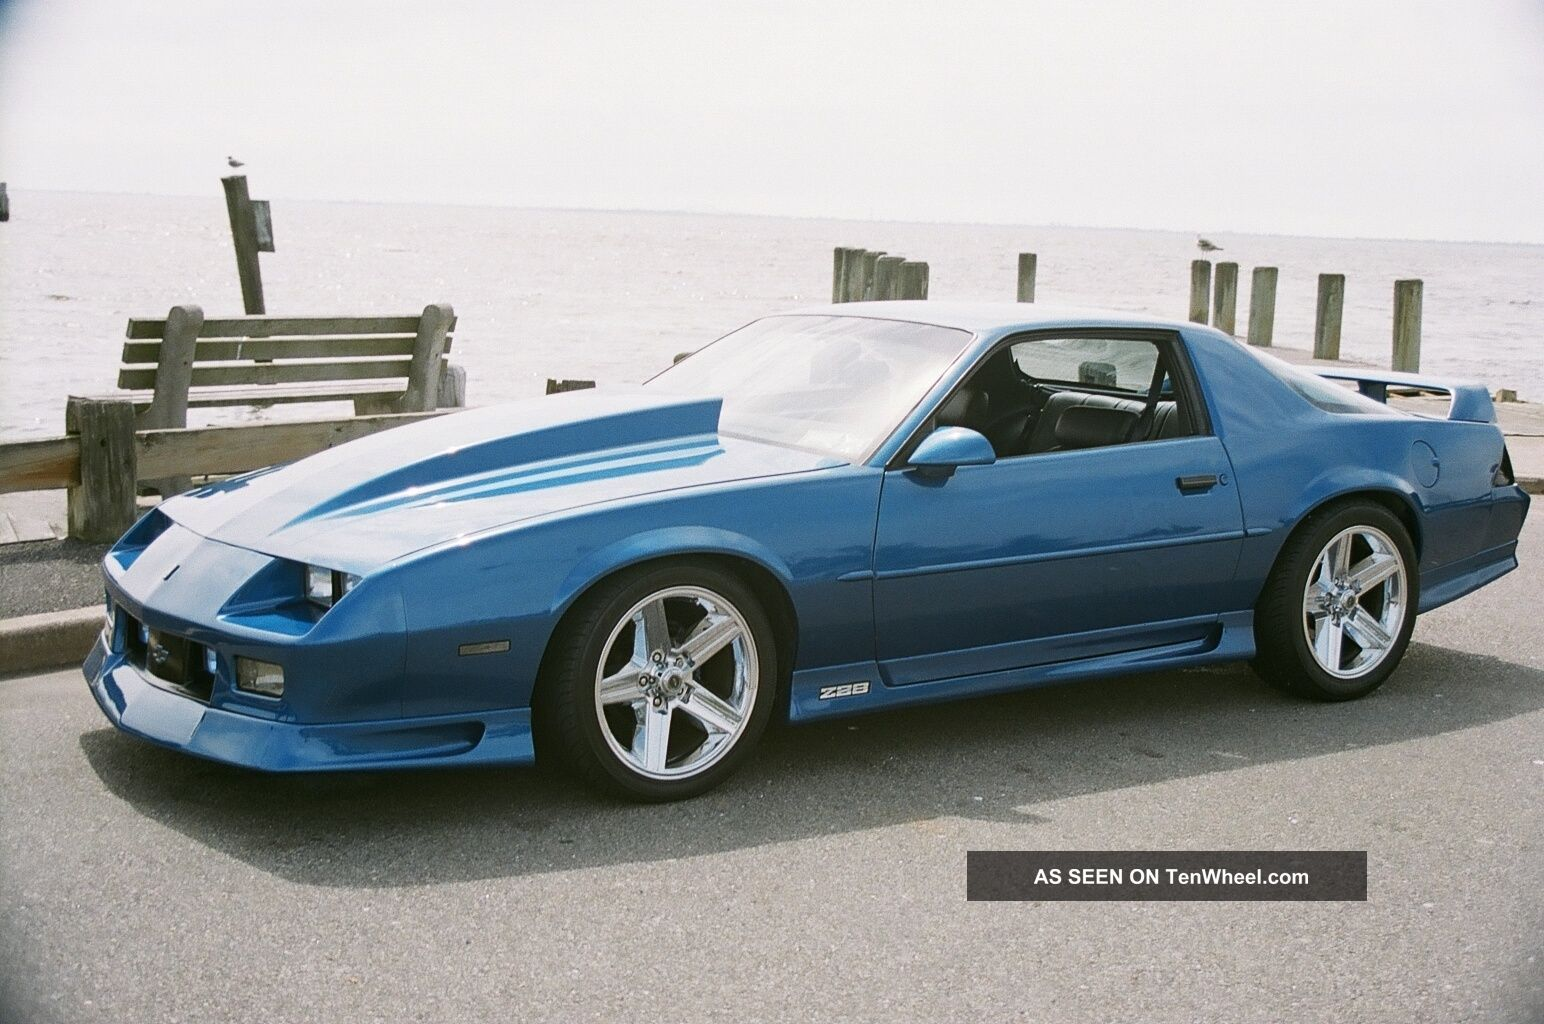 1991 camaro z28 street car camaro cheverlot camaro camaro vs mustang 1991 camaro z28 street car camaro